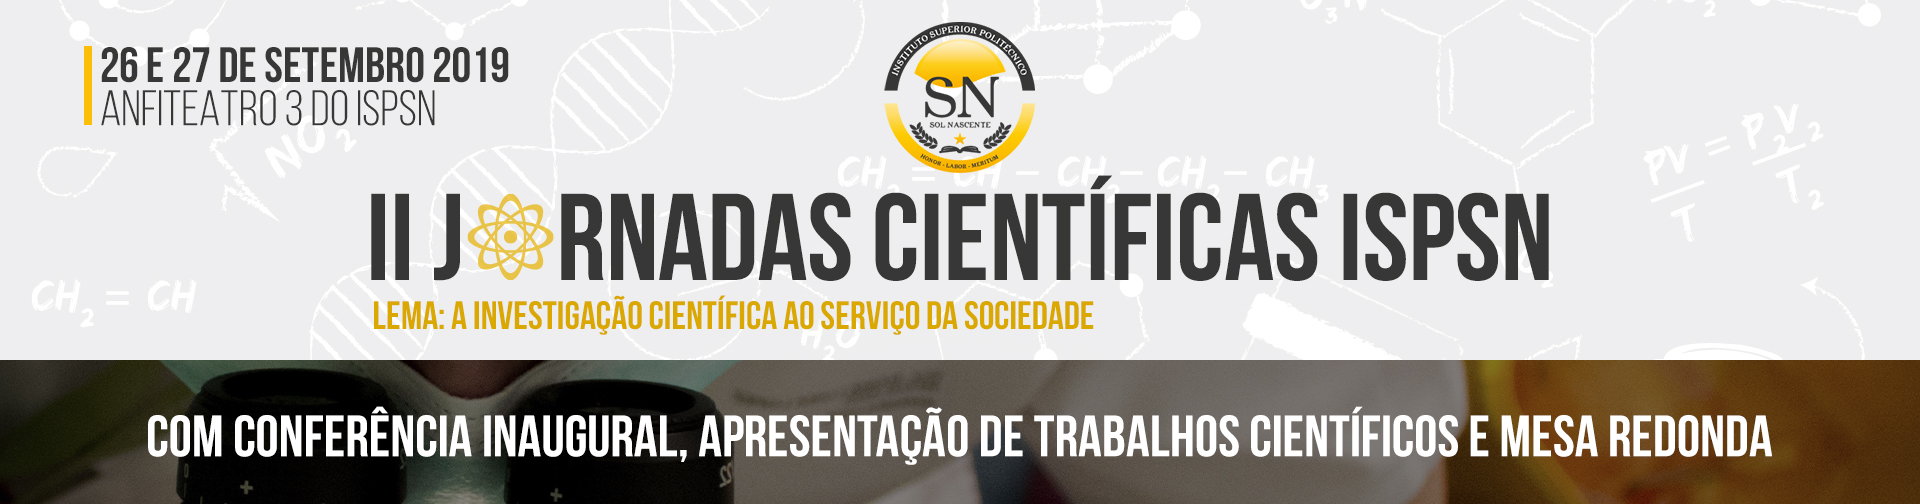 II Jornadas Científicas ISPSN